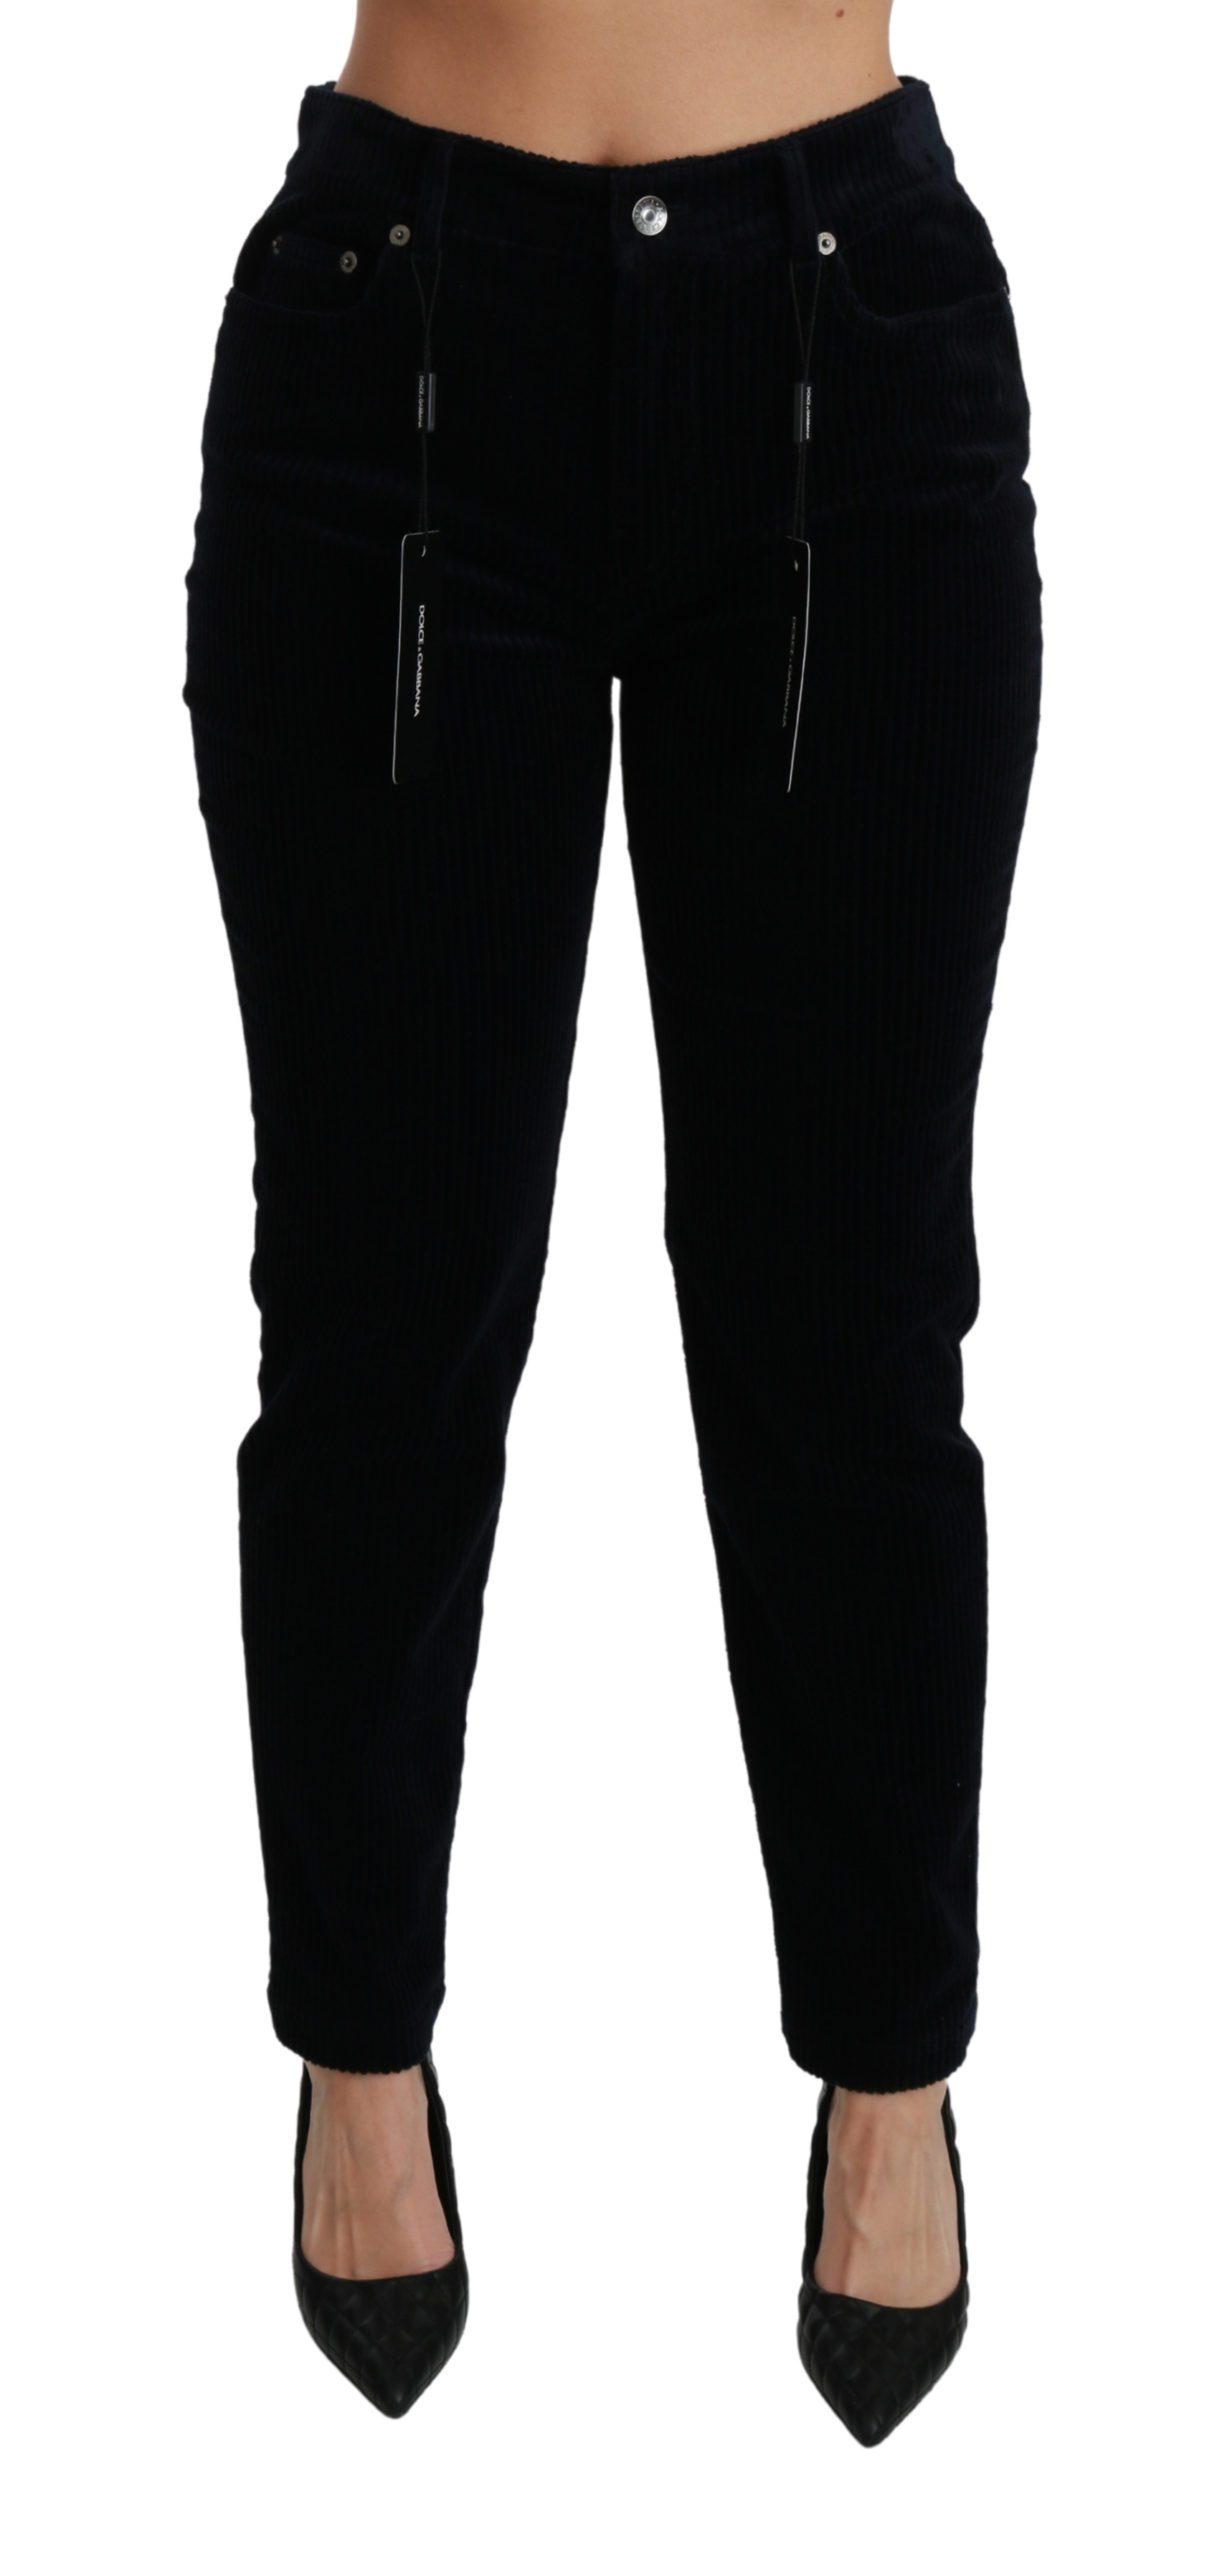 Dolce & Gabbana Women's Corduroy Mid Waist Skinny Jeans Blue PAN70925 - IT38|XS